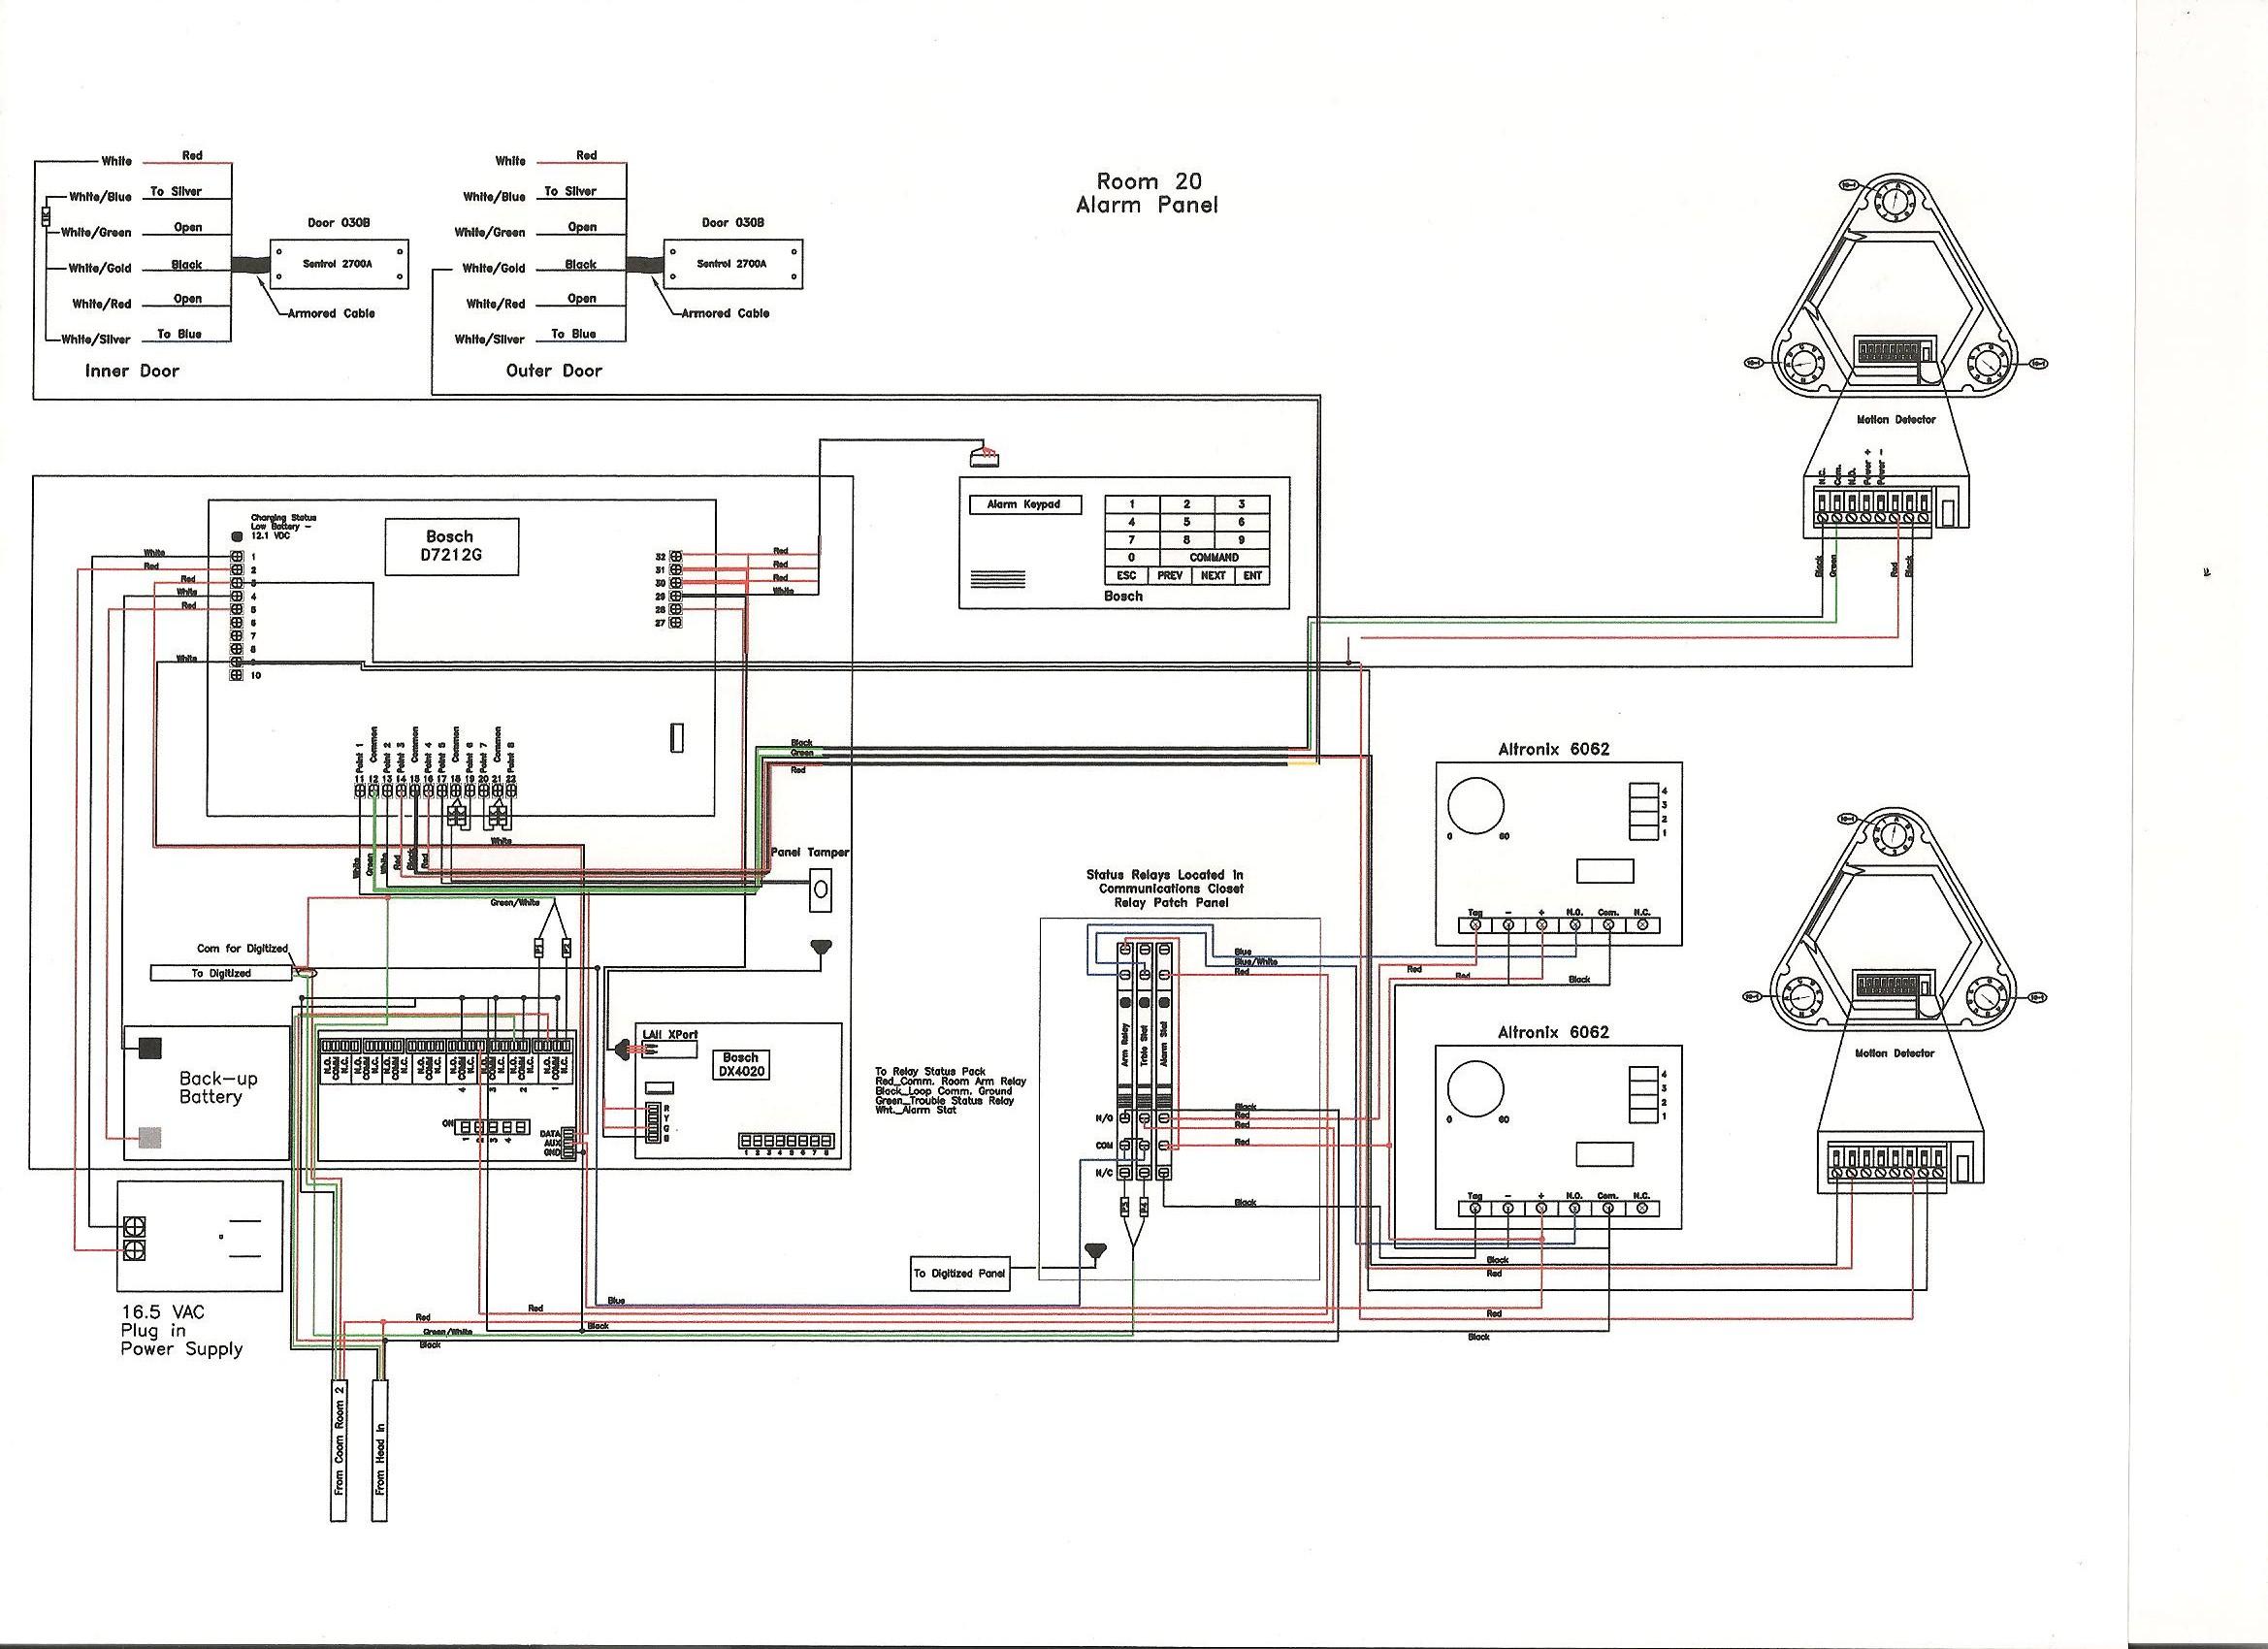 sample circuit diagram sample image wiring diagram sample wiring schematic mazda cx 7 radio wiring diagram on sample circuit diagram